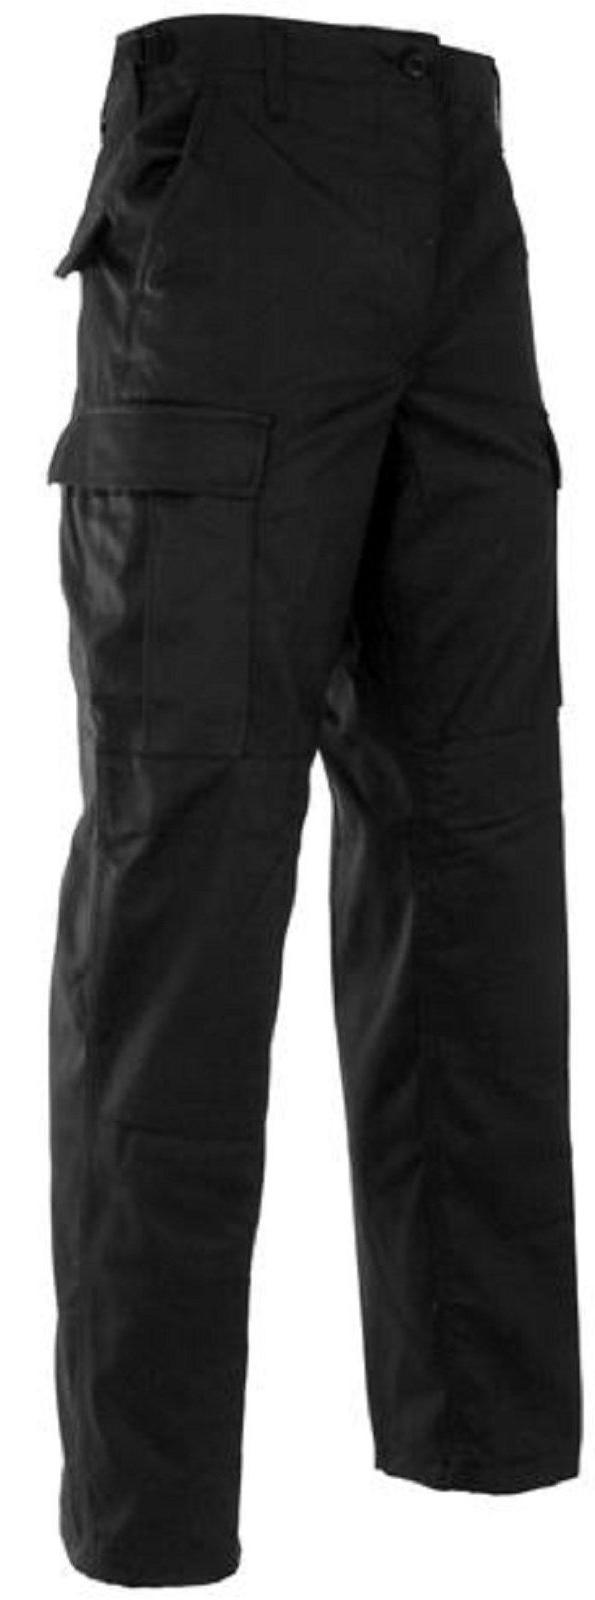 BLACK ROTHCO 5923 BDU PANTS MENS SECURITY 4X